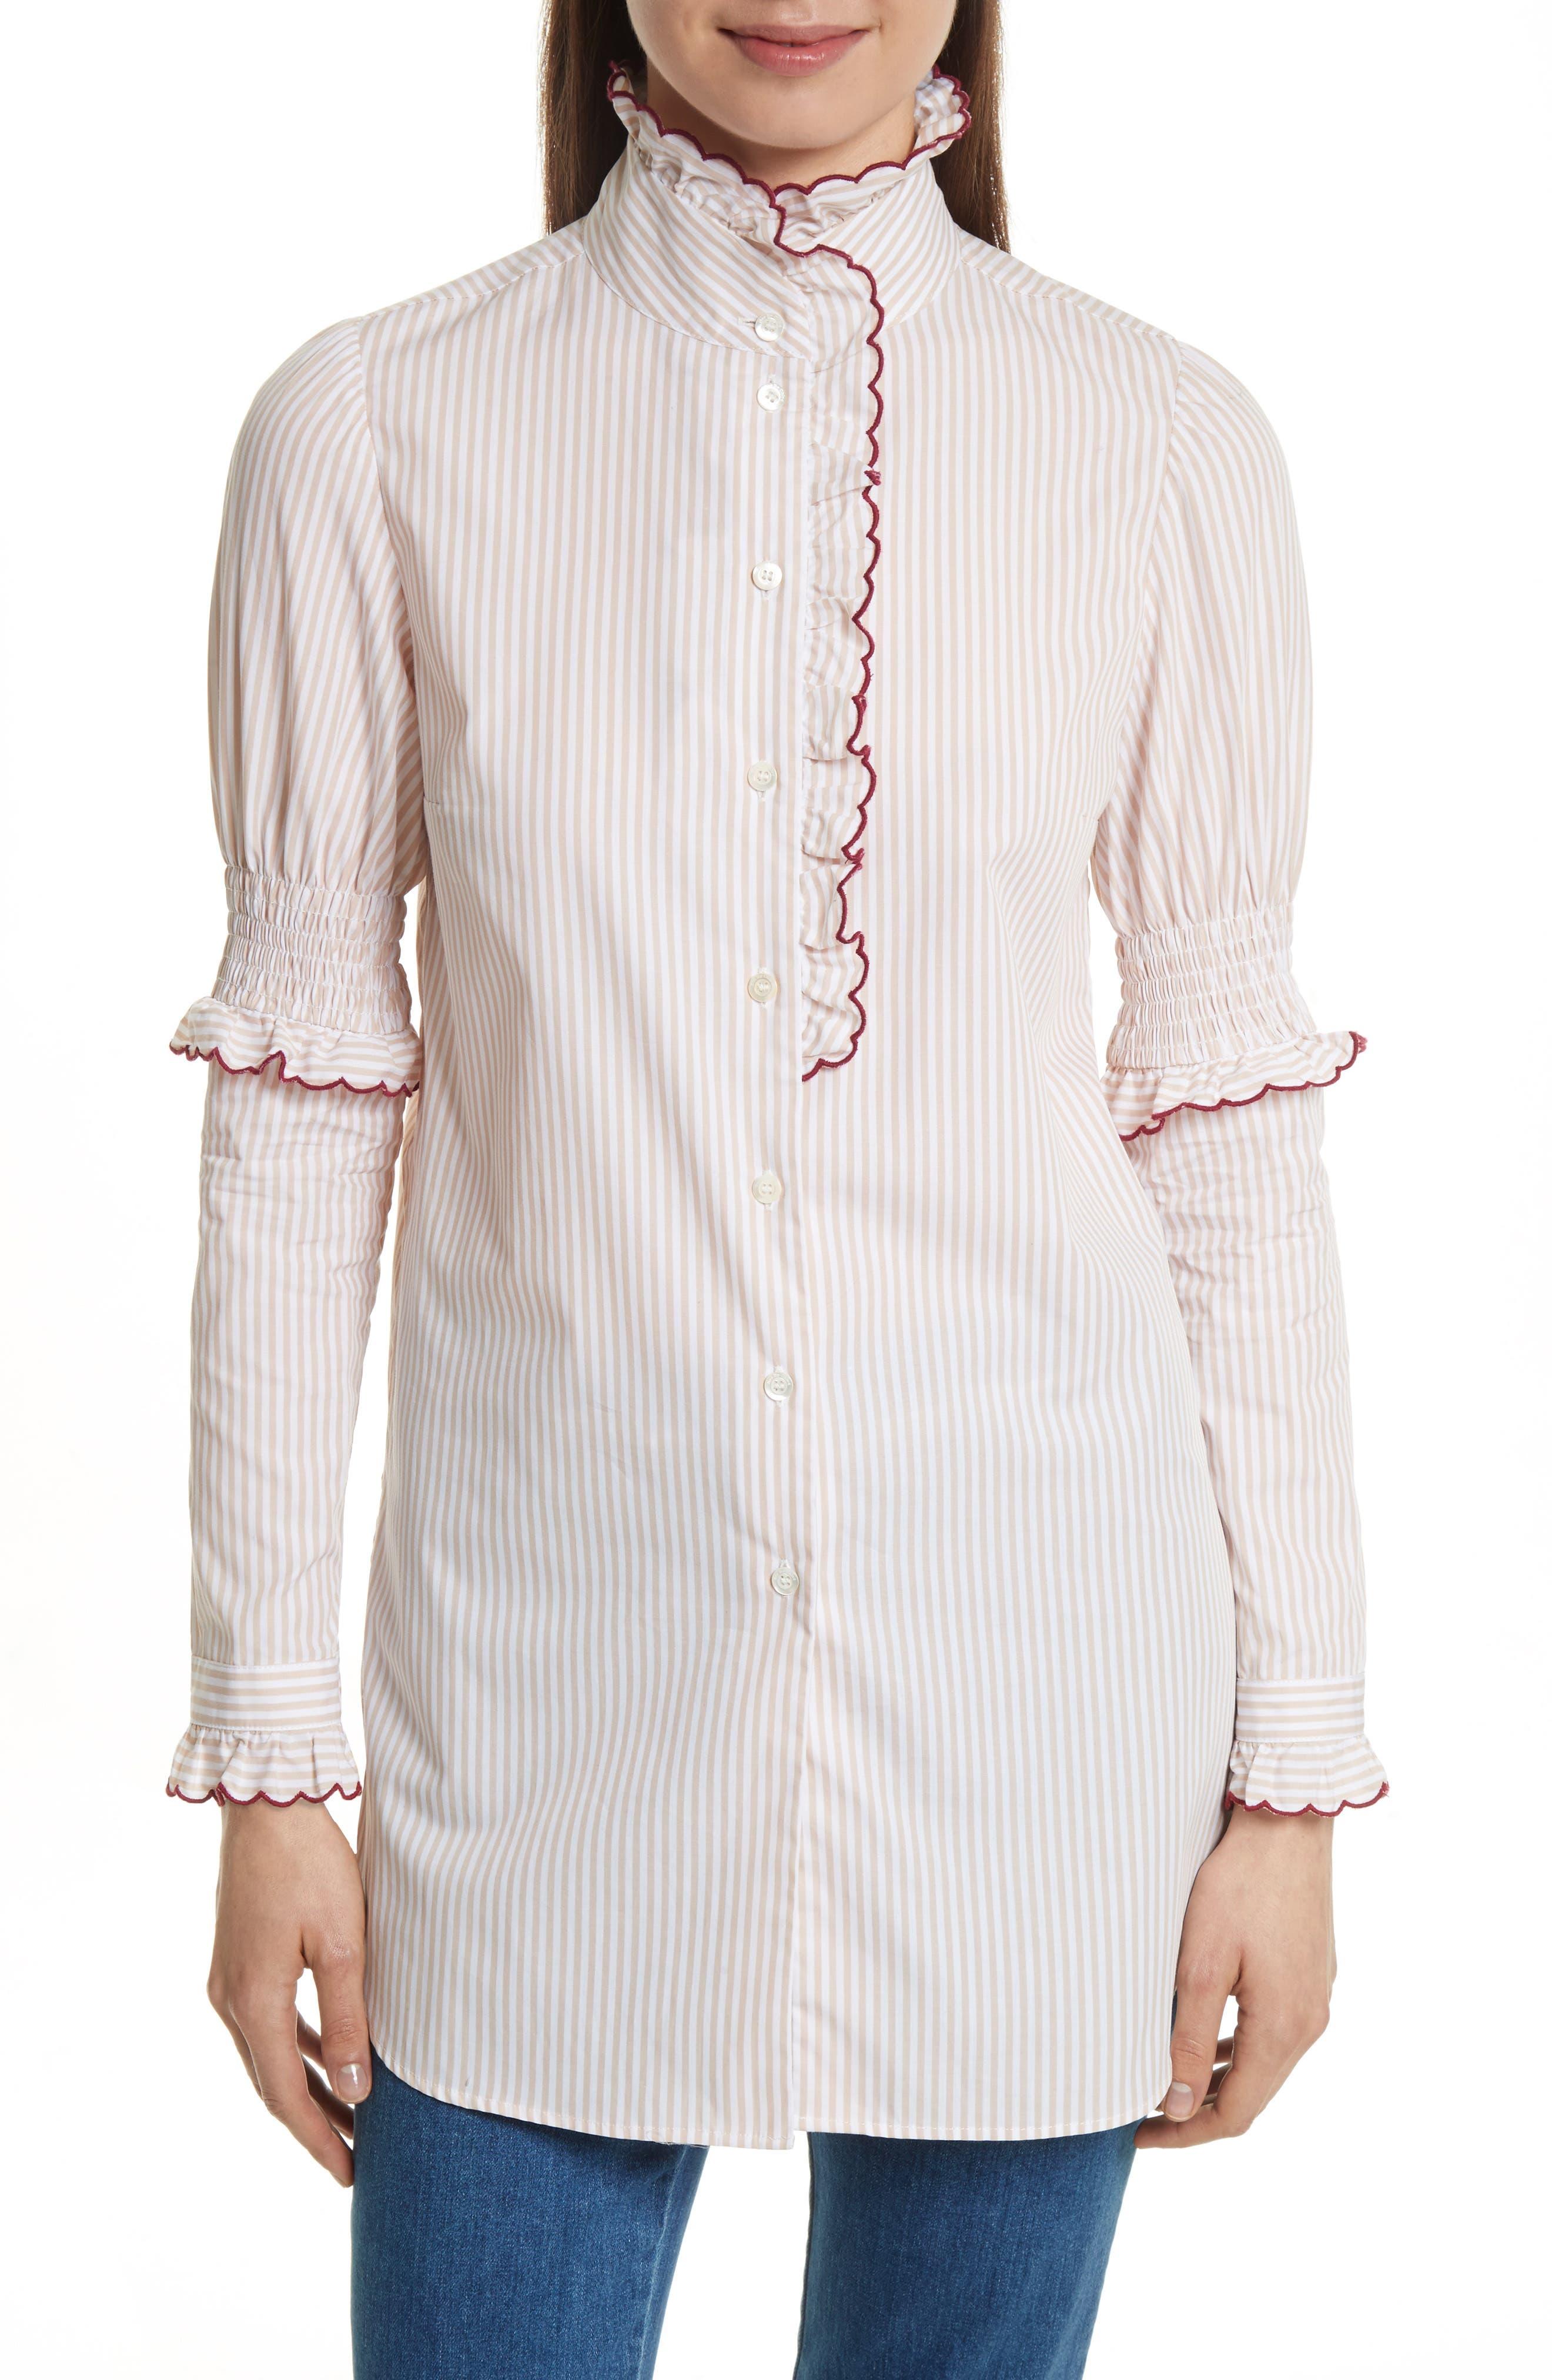 Stripe Cotton Shirt,                         Main,                         color, Beige-White